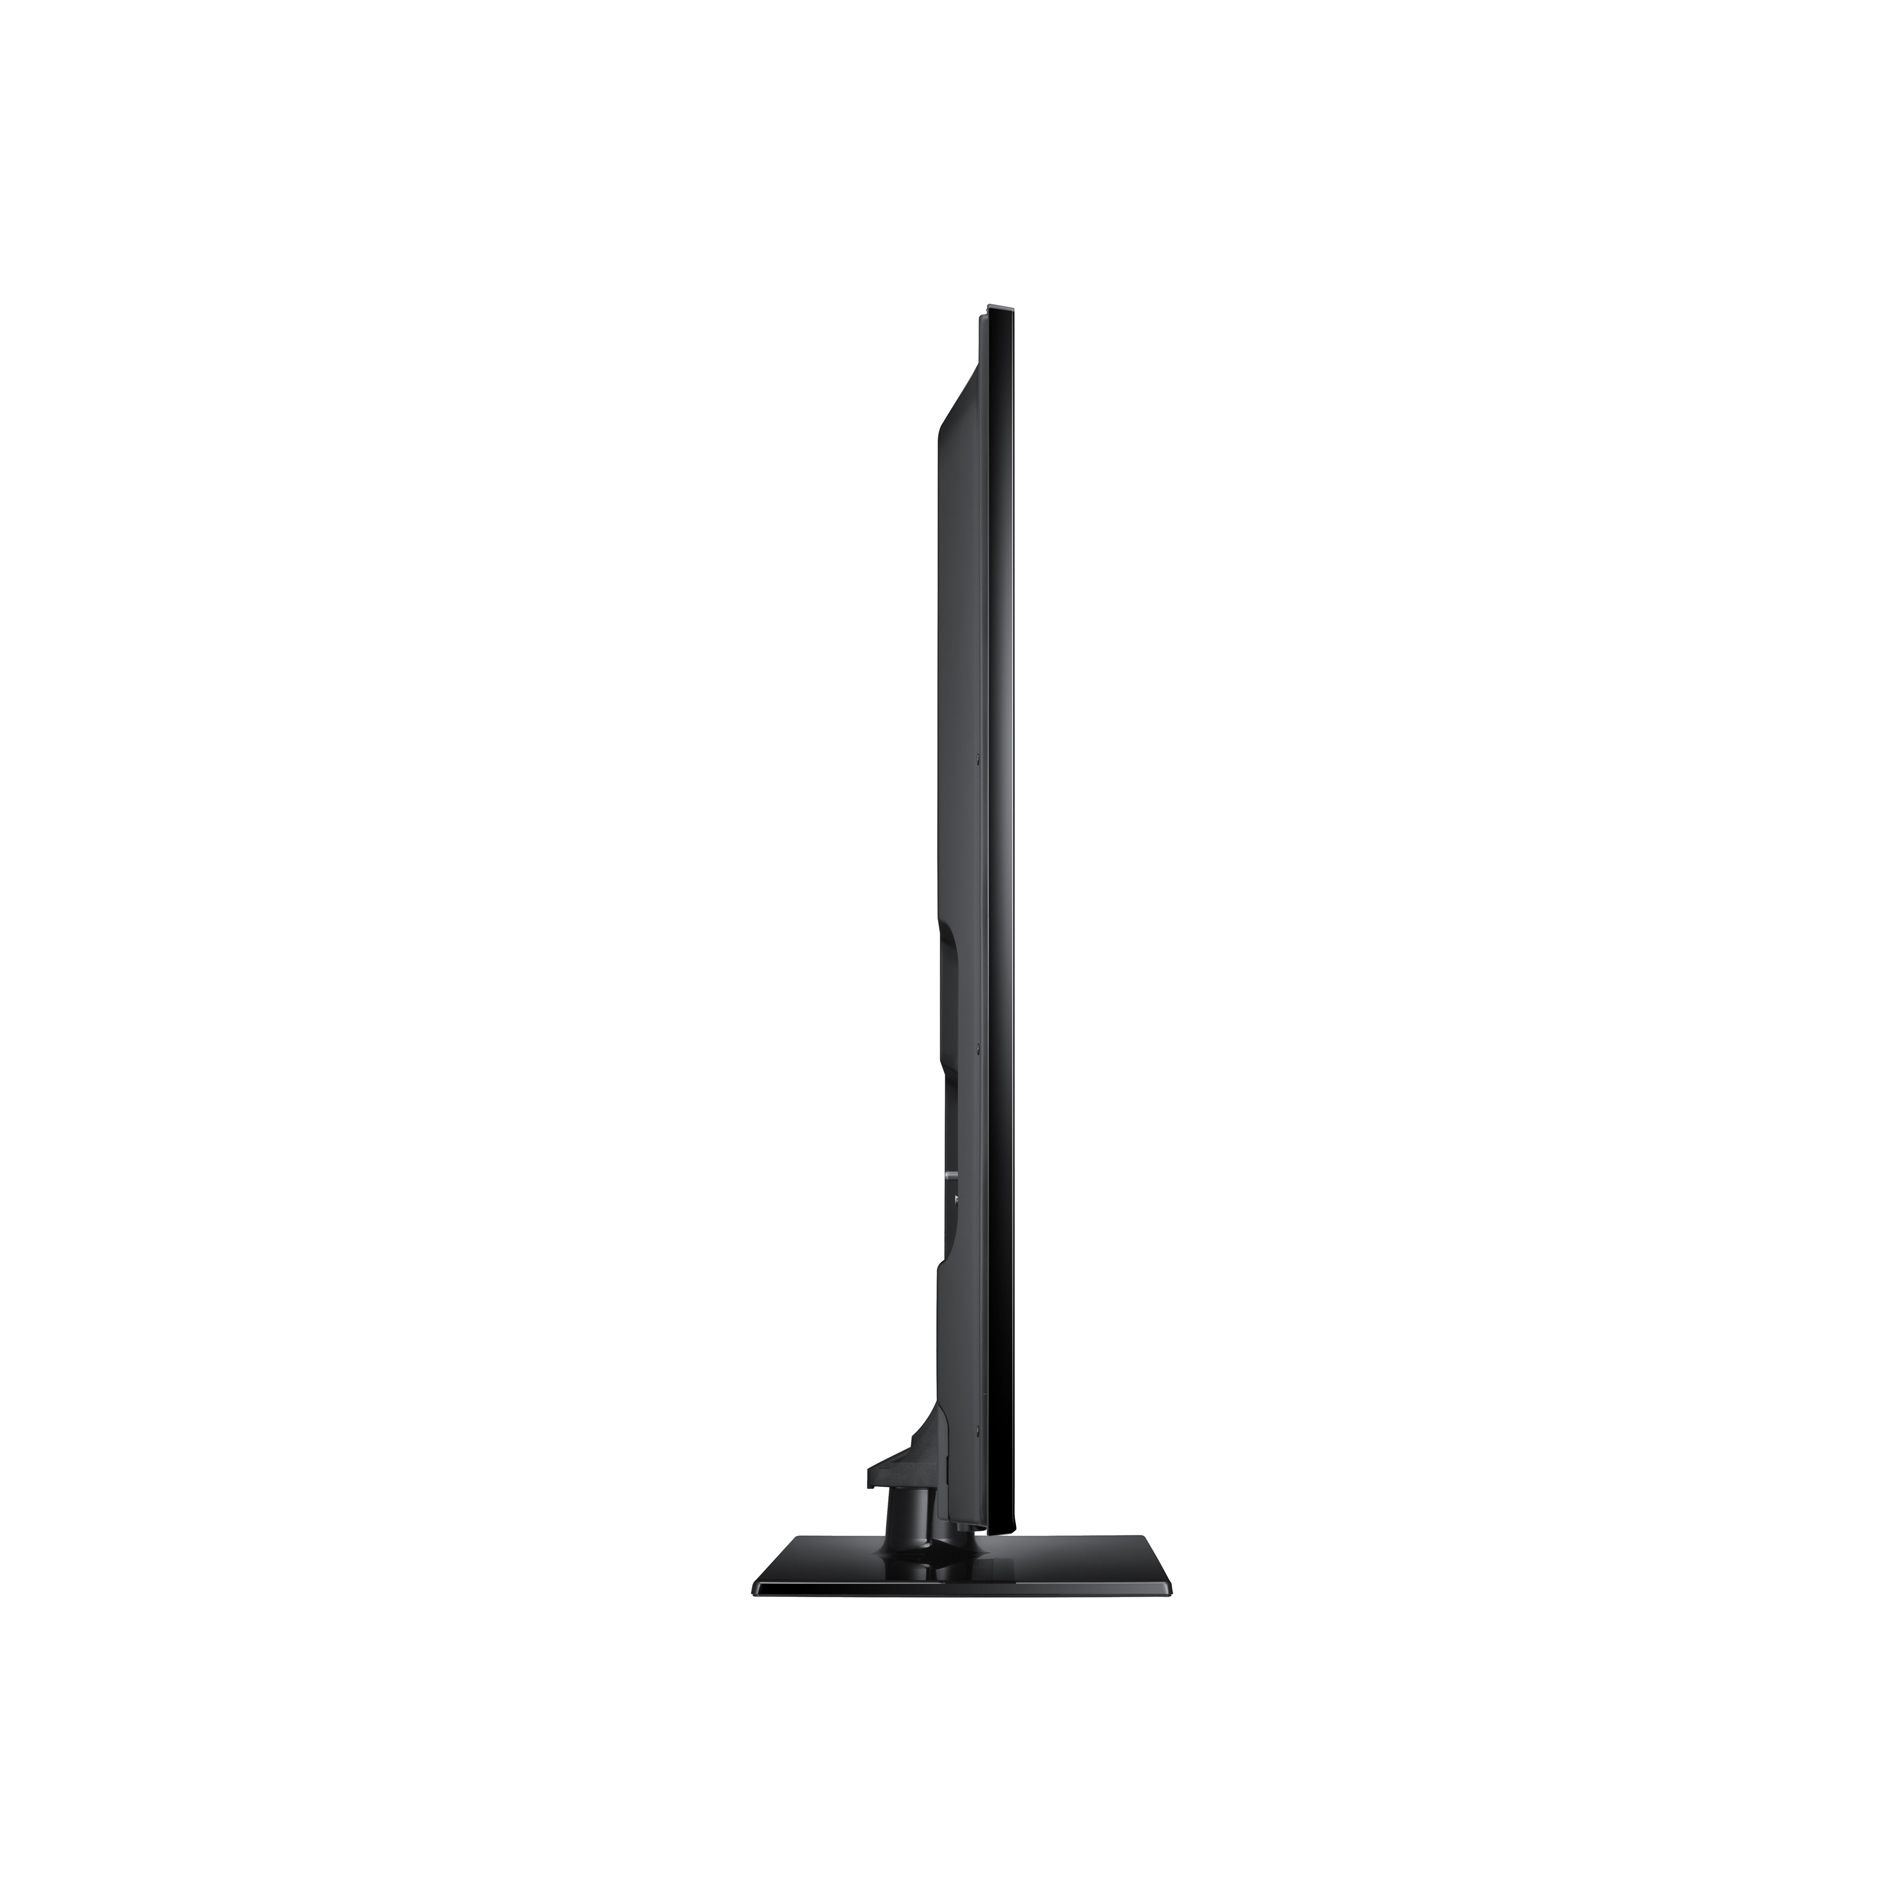 "Samsung 51"" Class 1080p 600Hz Plasma HDTV - PN51E530A3FXZA"